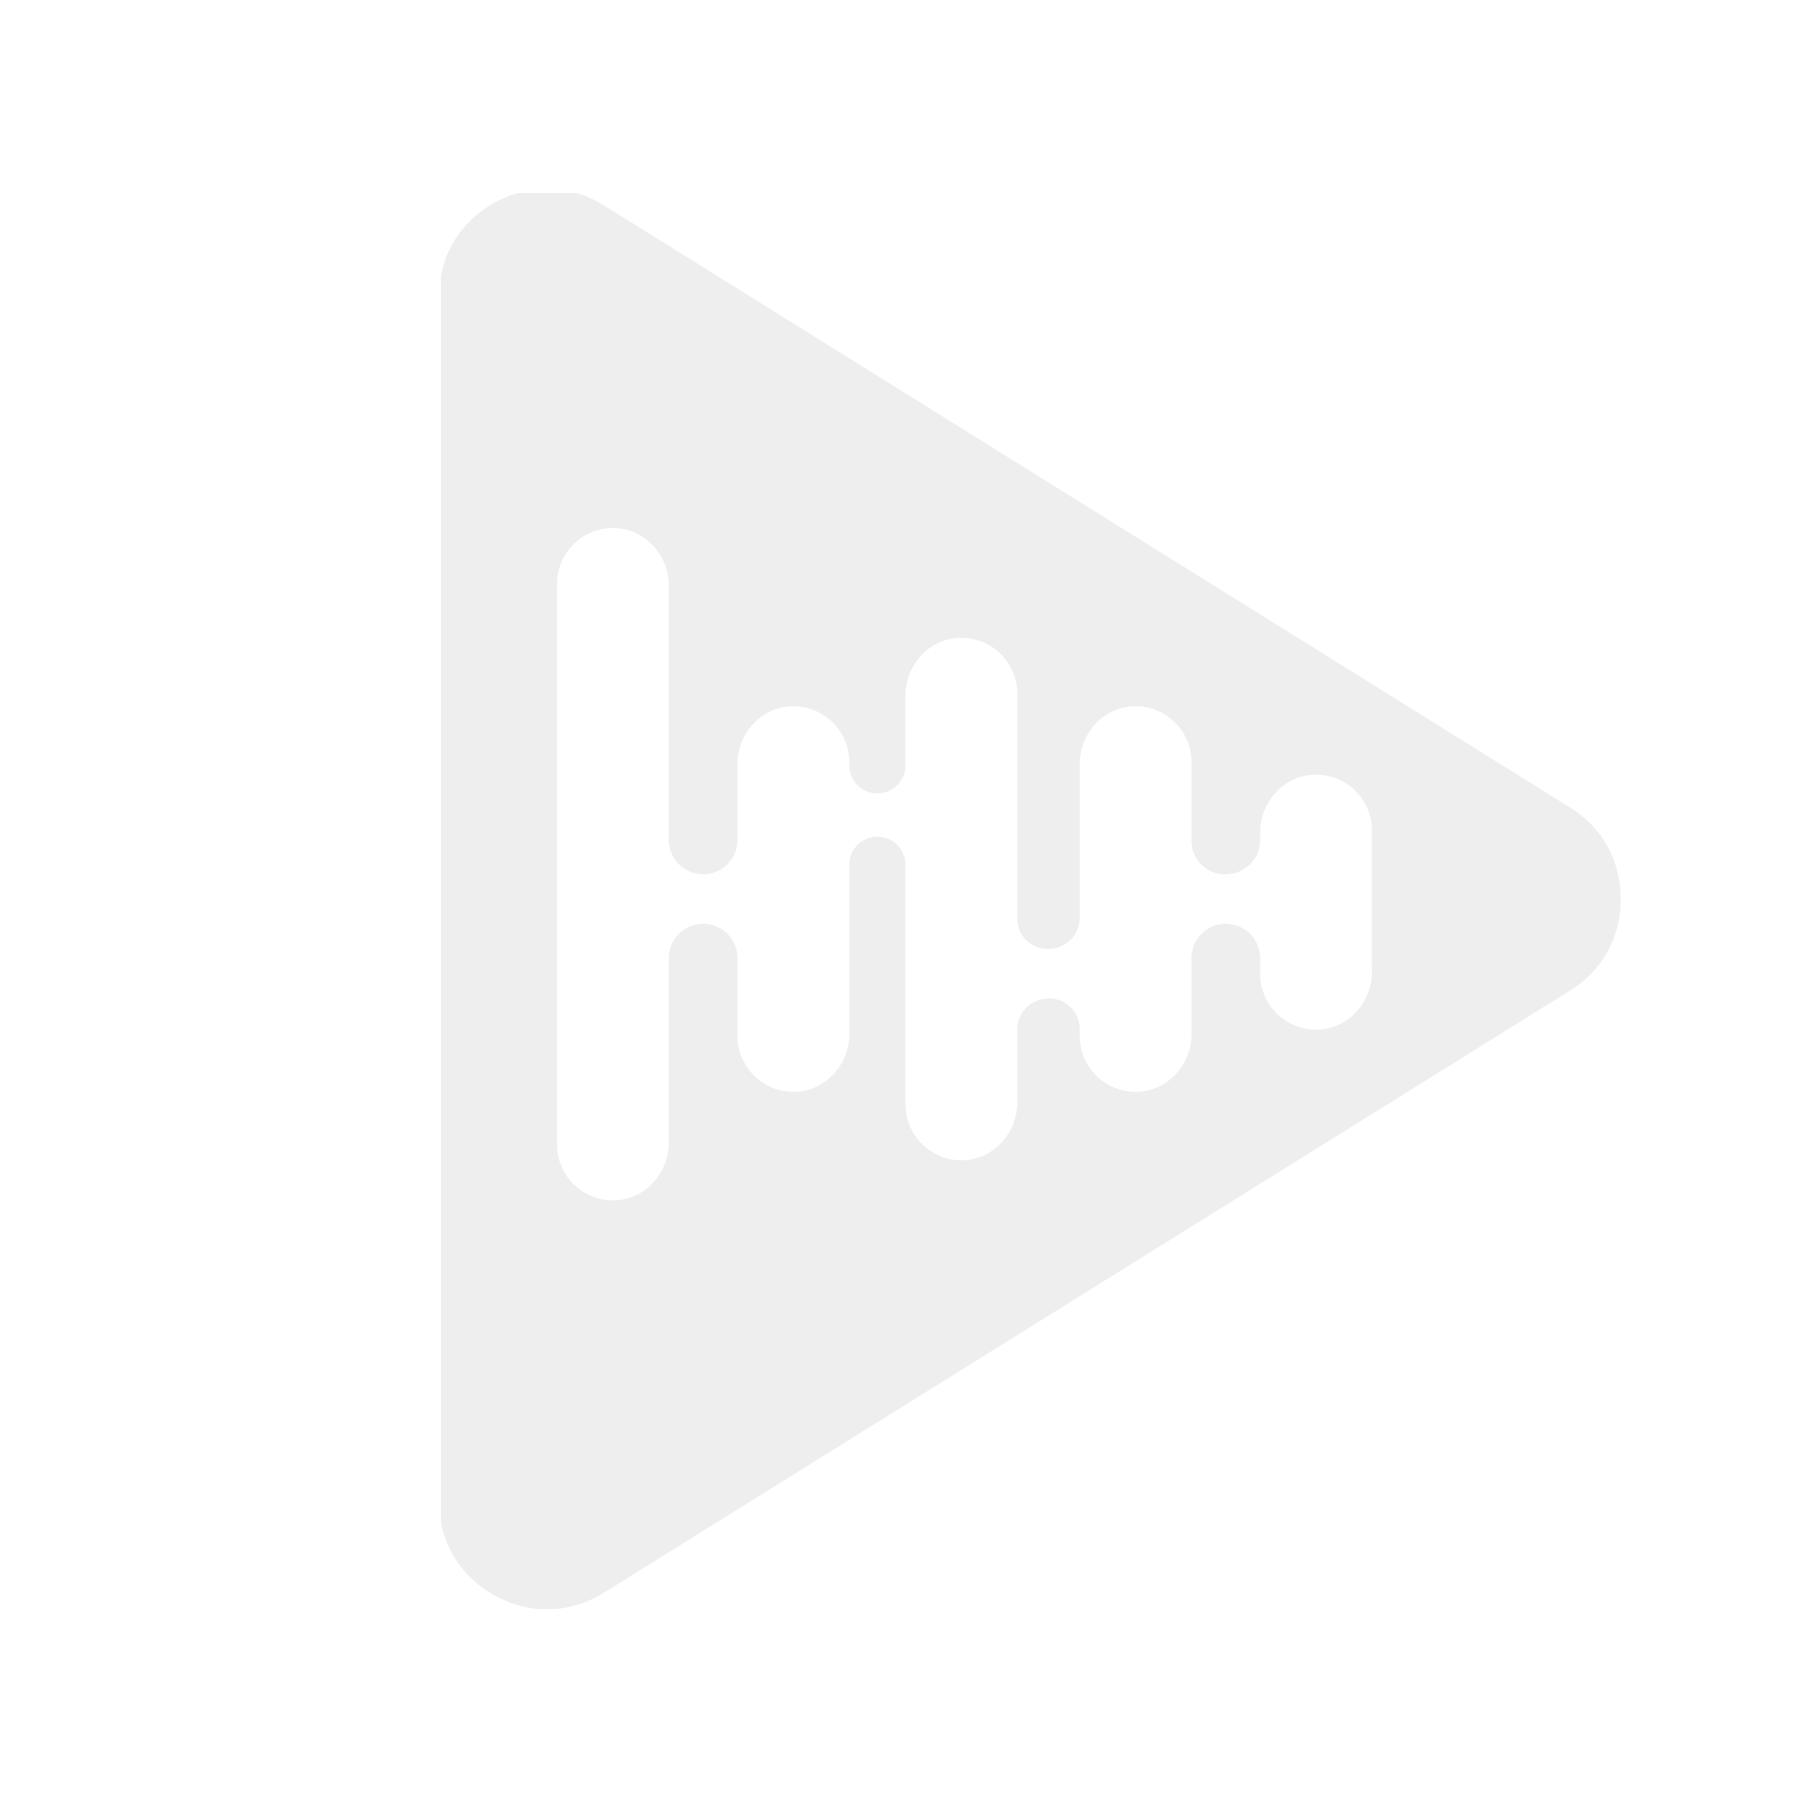 Klipsch 1011657